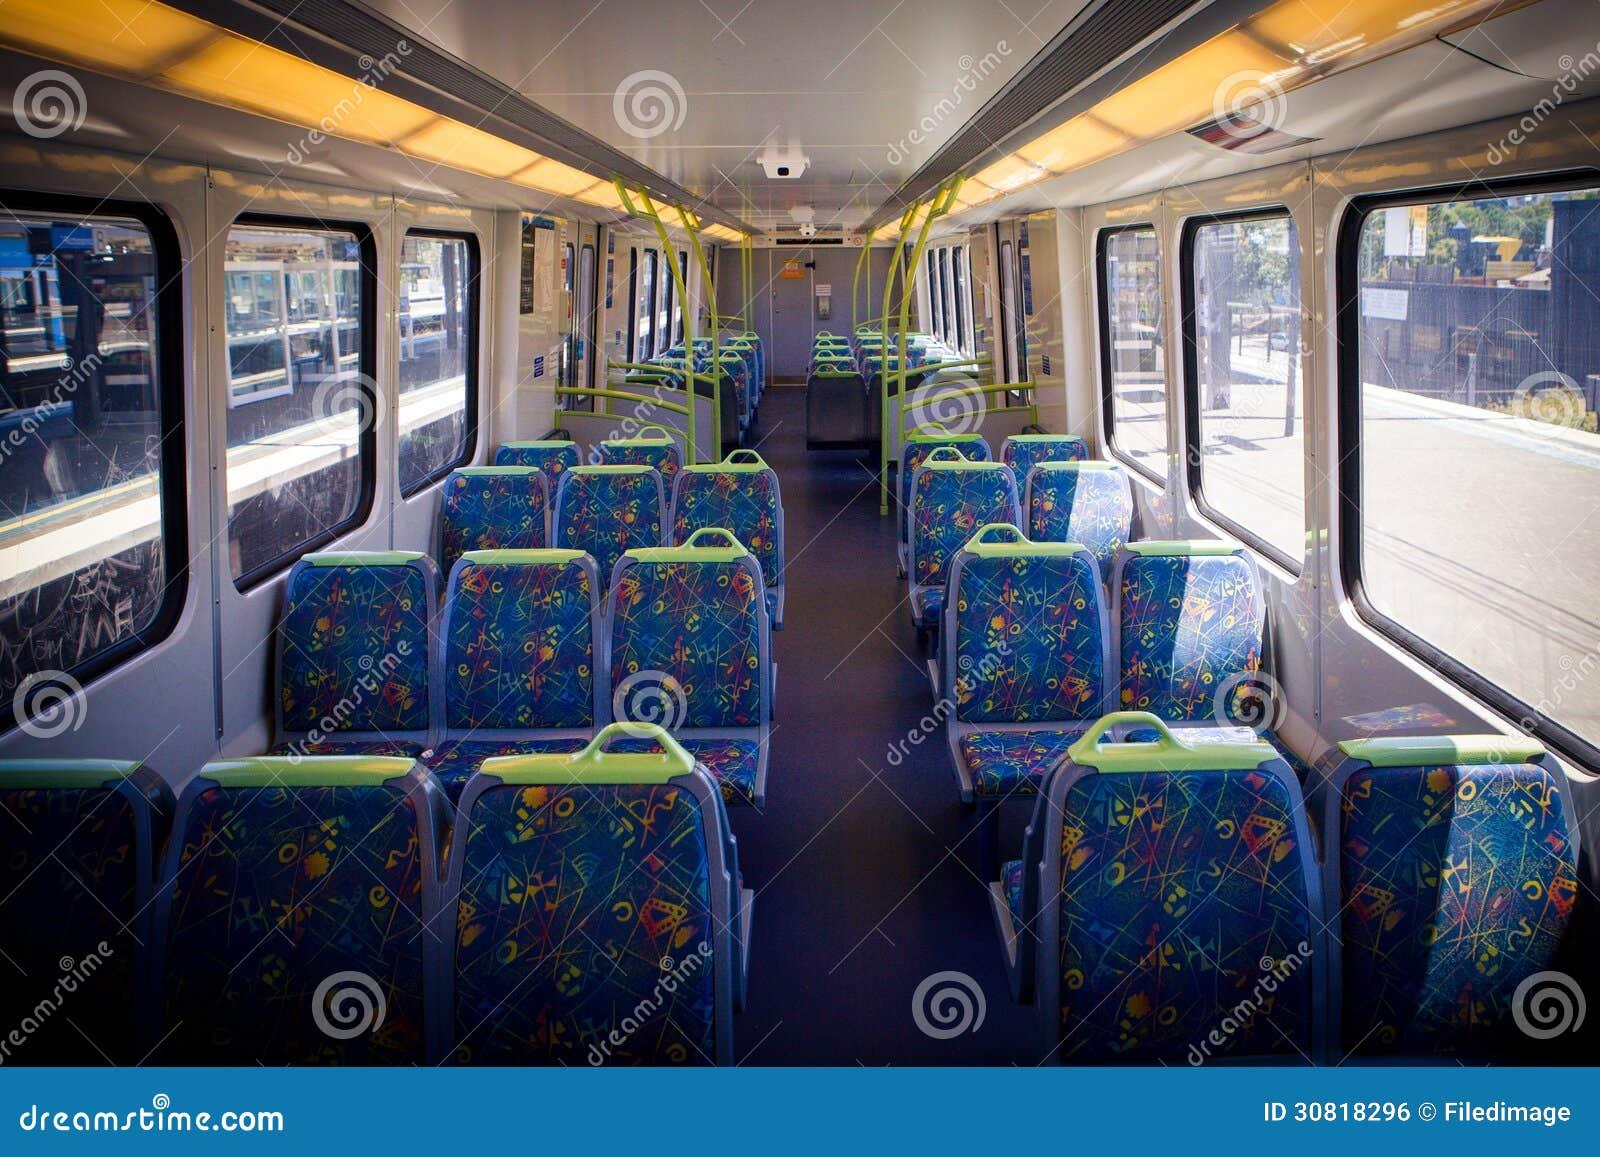 Melbourne Train Interior Royalty Free Stock Image Image